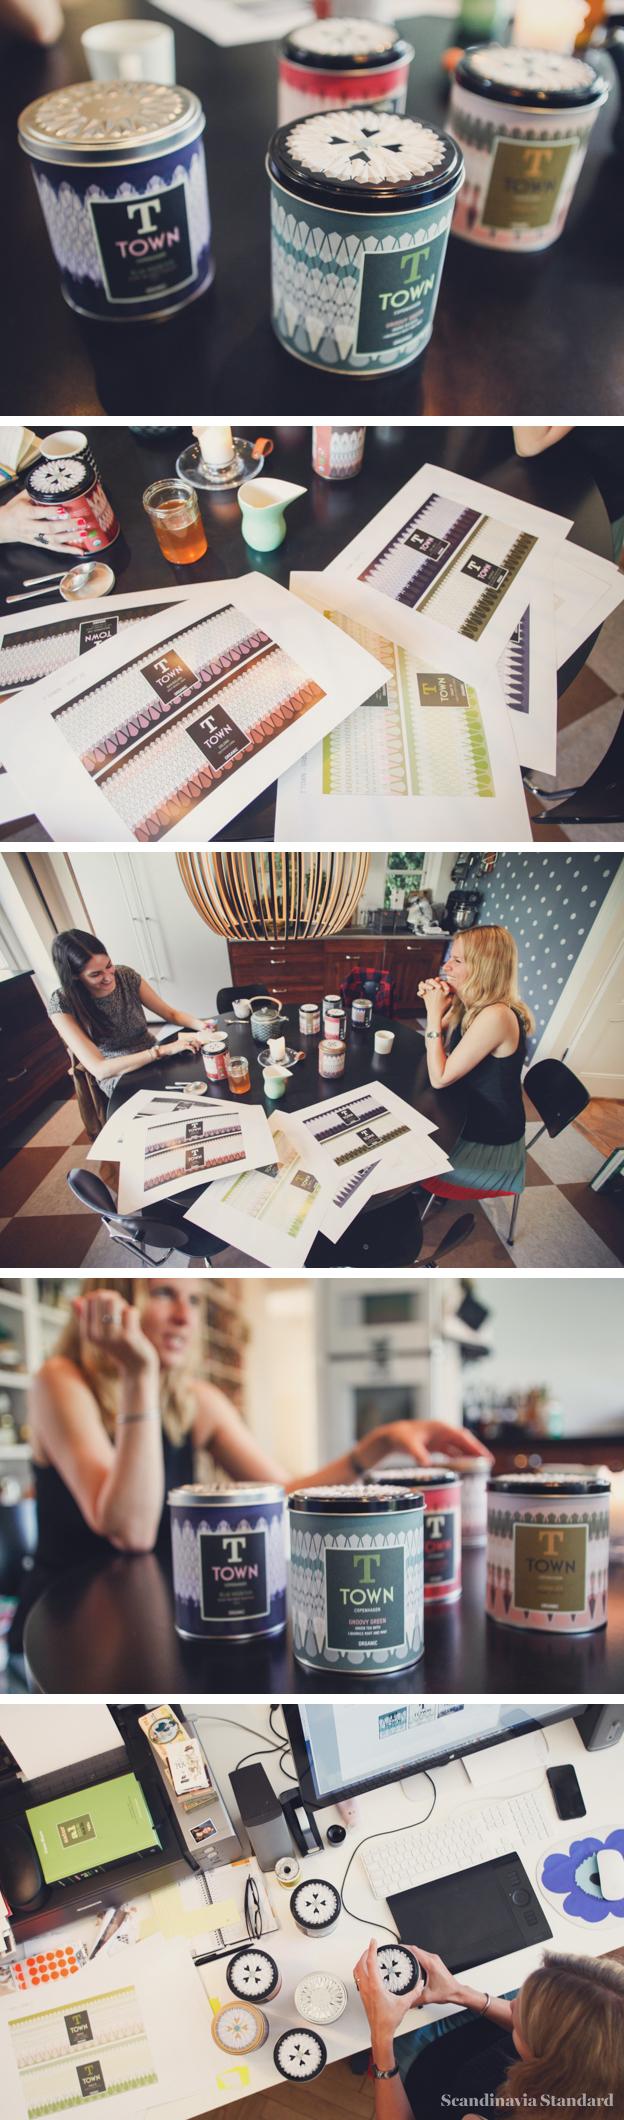 T Town Collage | Scandinavia Standard